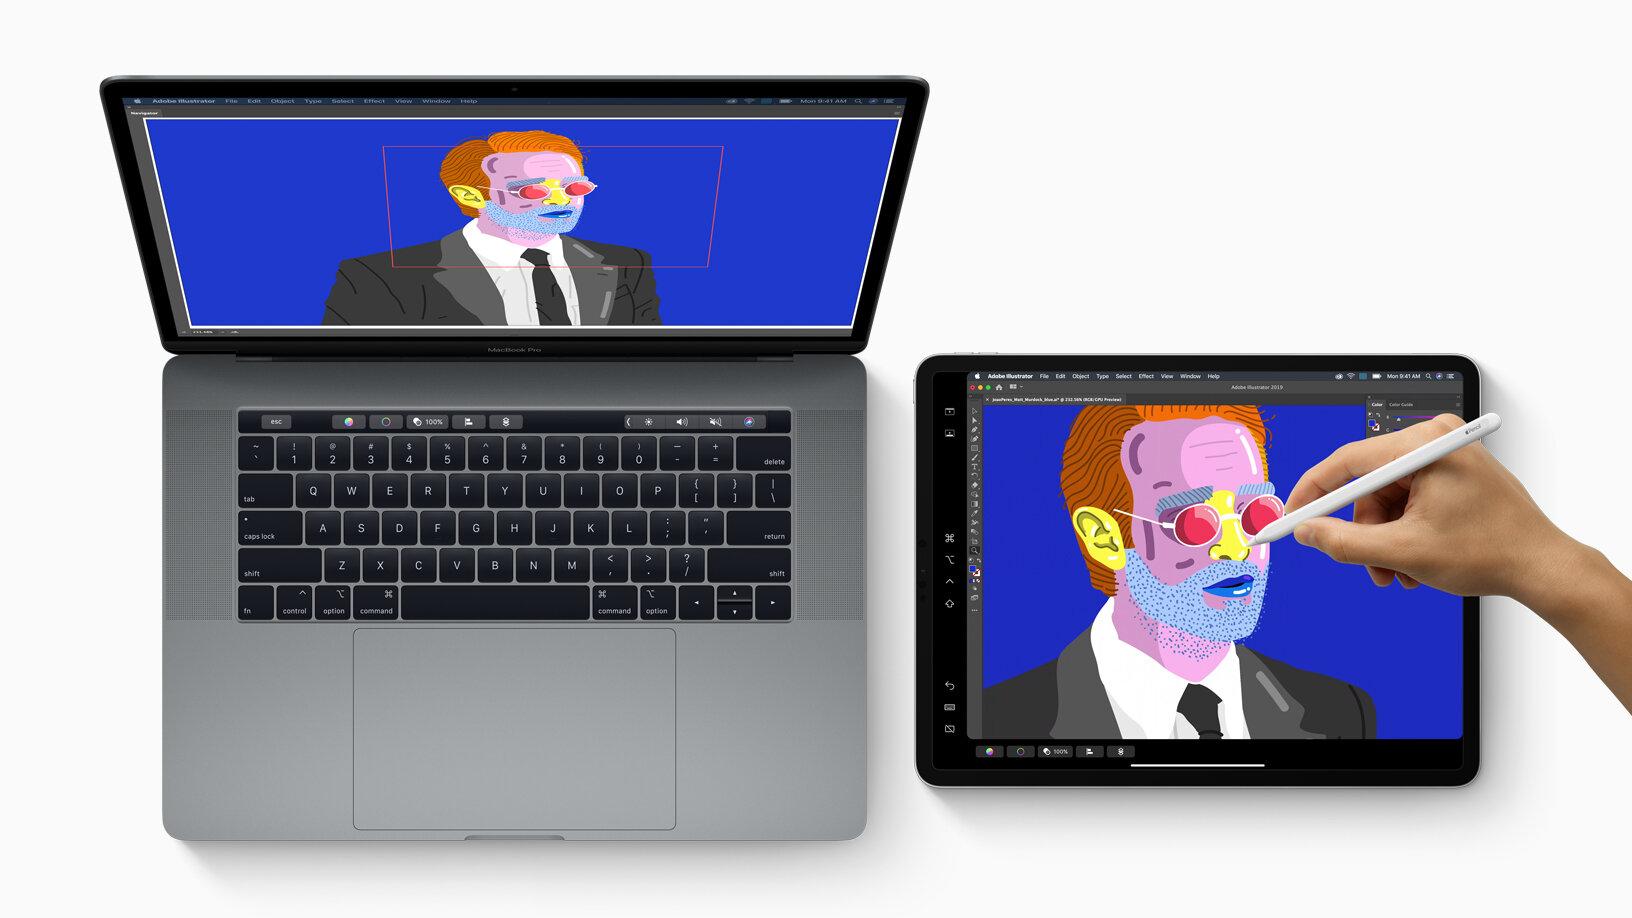 Apple macOS 10.15 Catalina: Sidecar